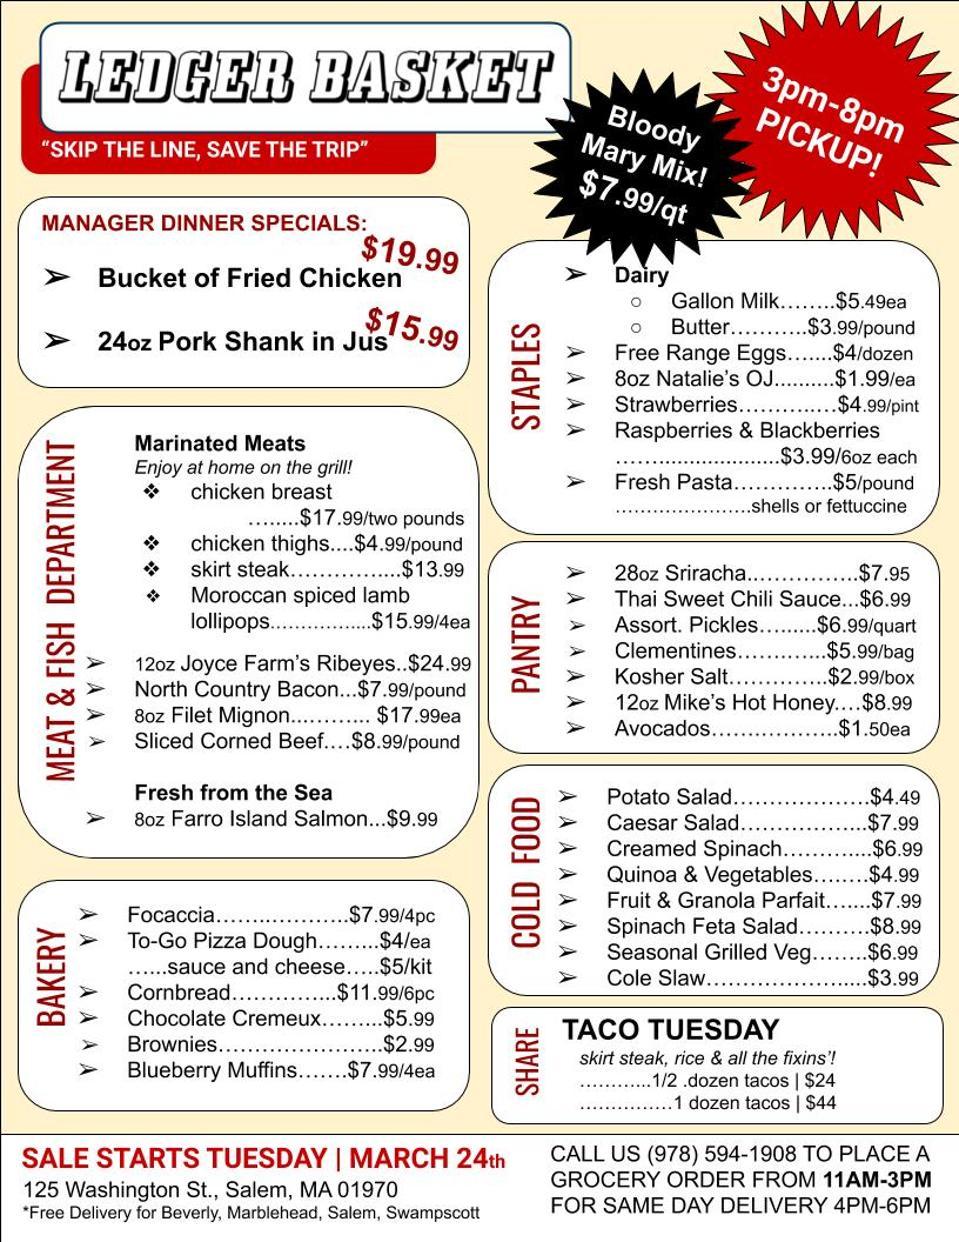 Ledger takeout restaurant menu